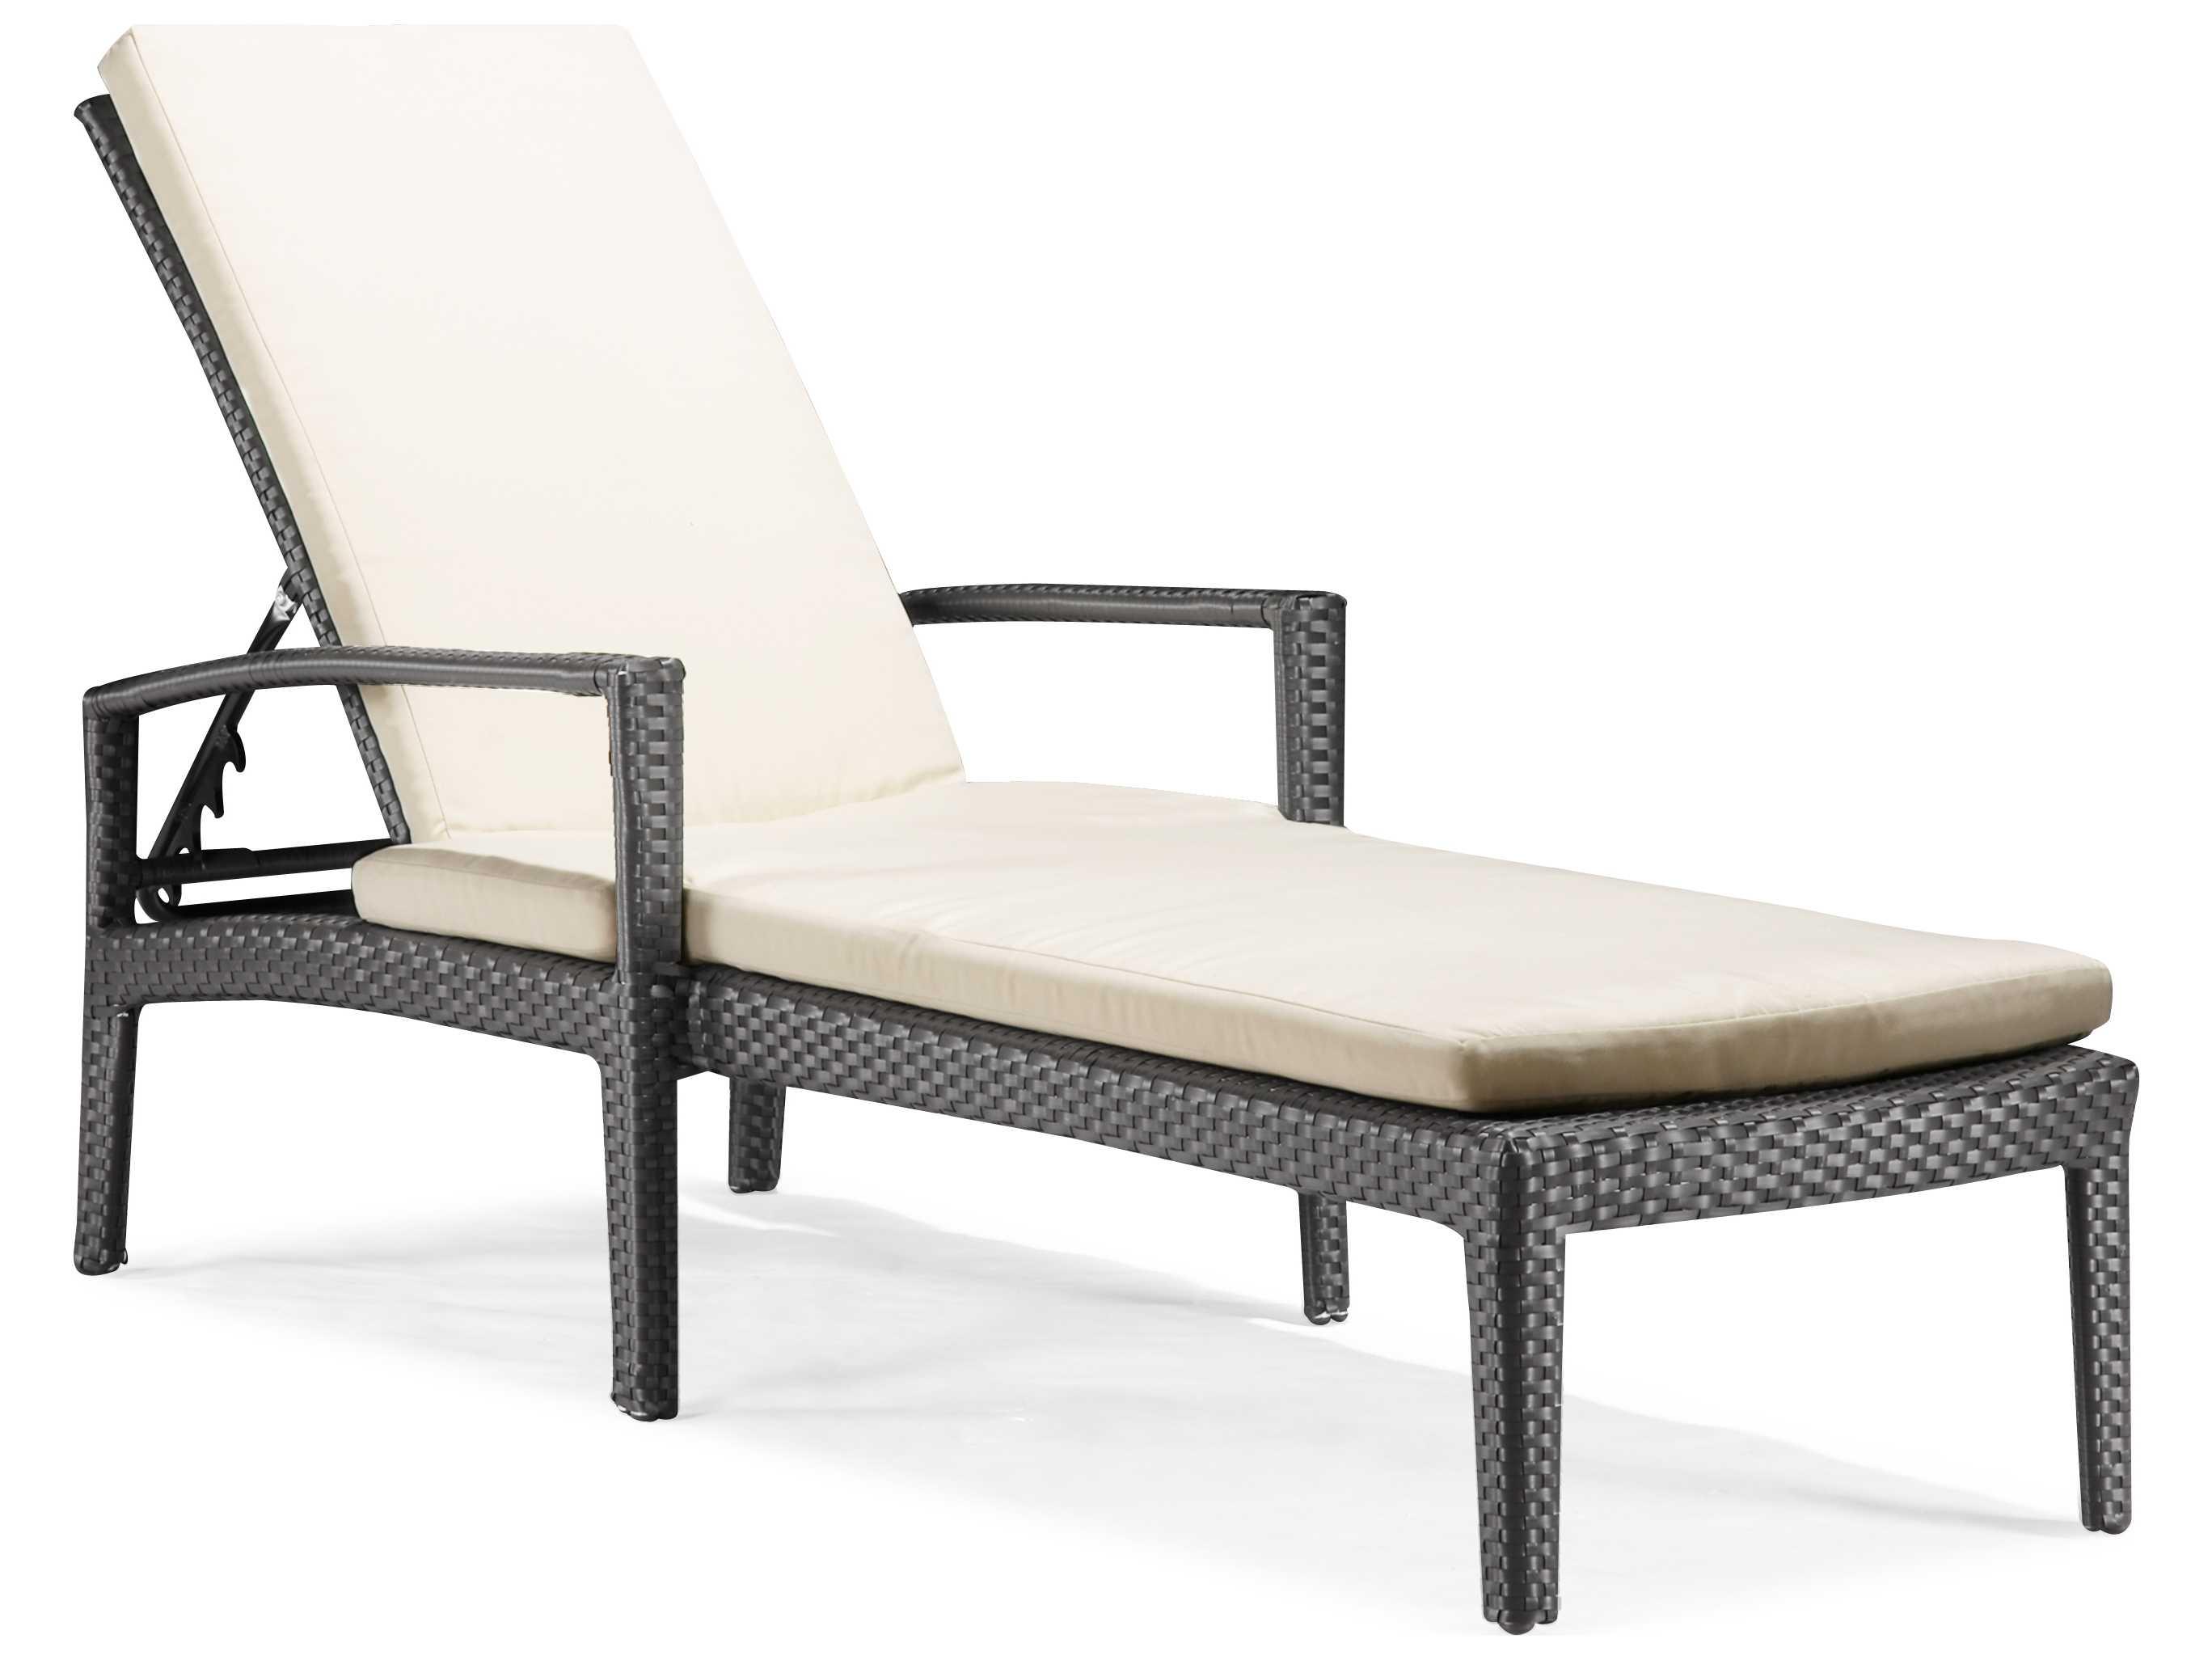 zuo outdoor phuket wicker chaise lounge zd701137